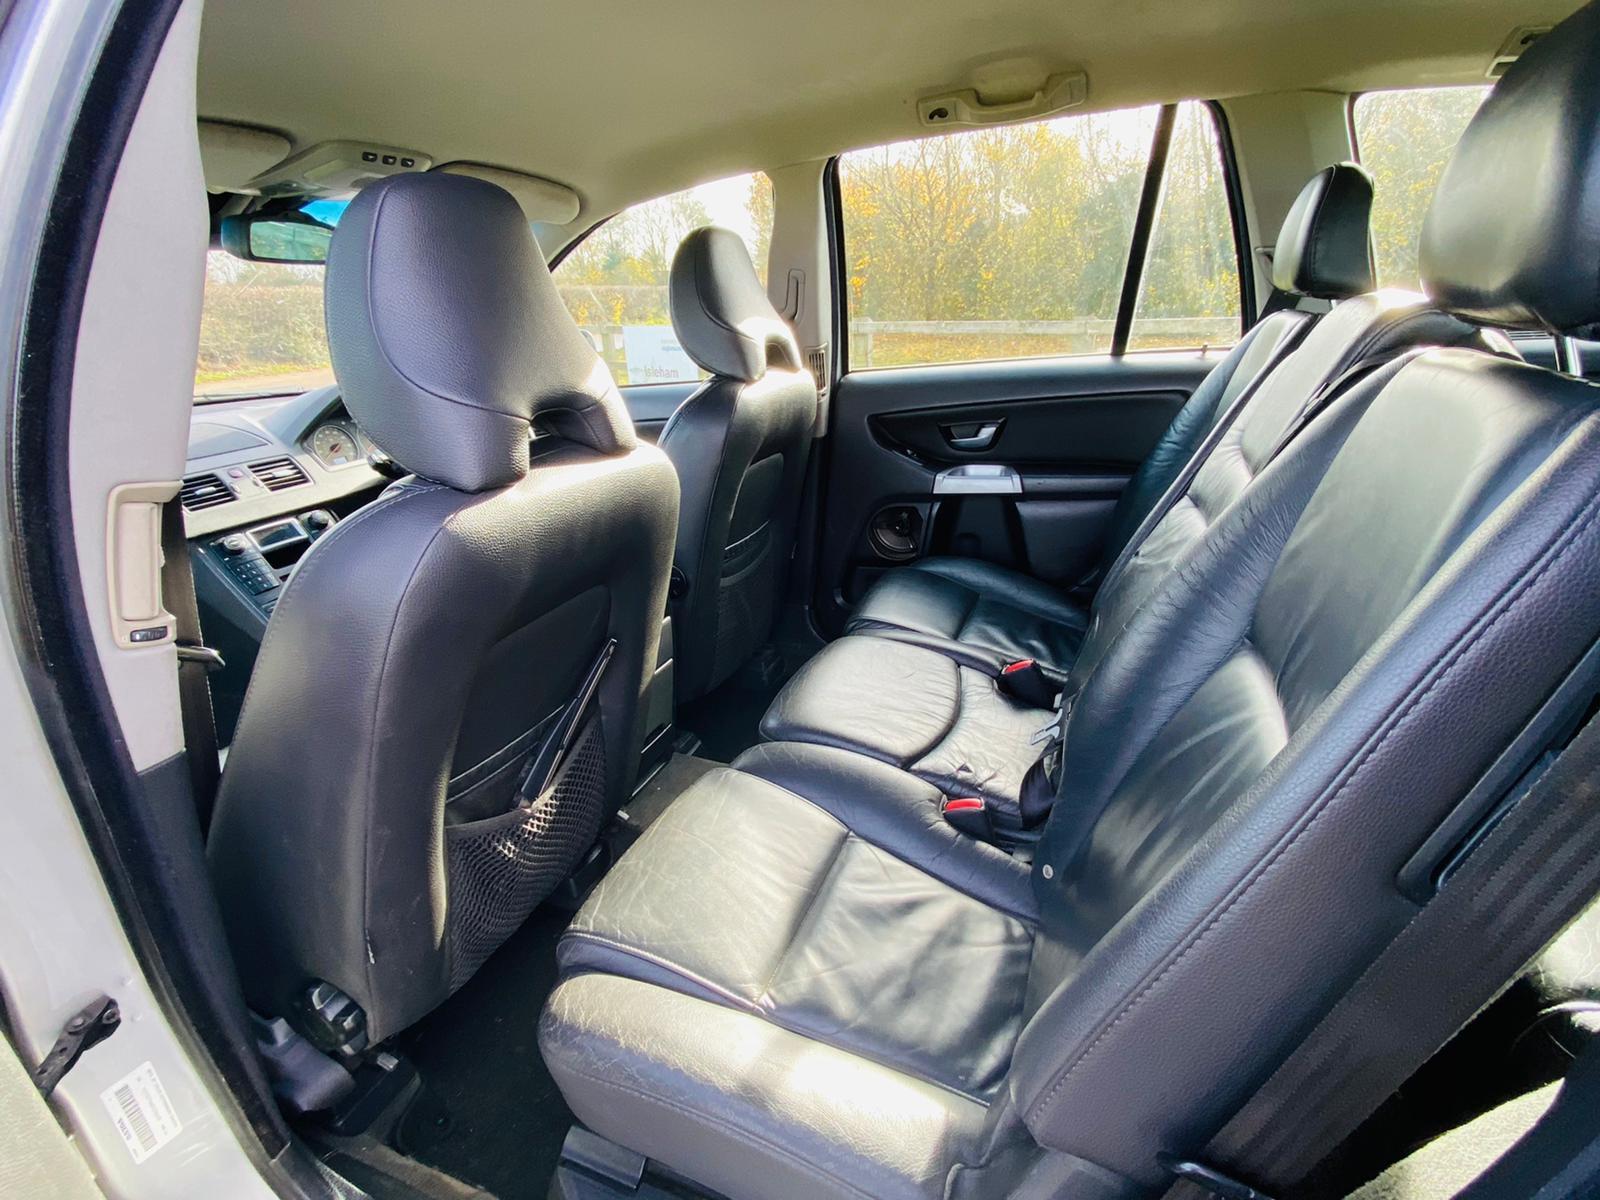 Volvo XC90 2.4 D5 185bhp SE Geartronic Auto 2006 06 Reg - 7 Seats - Air con - Top Spec - Image 42 of 47